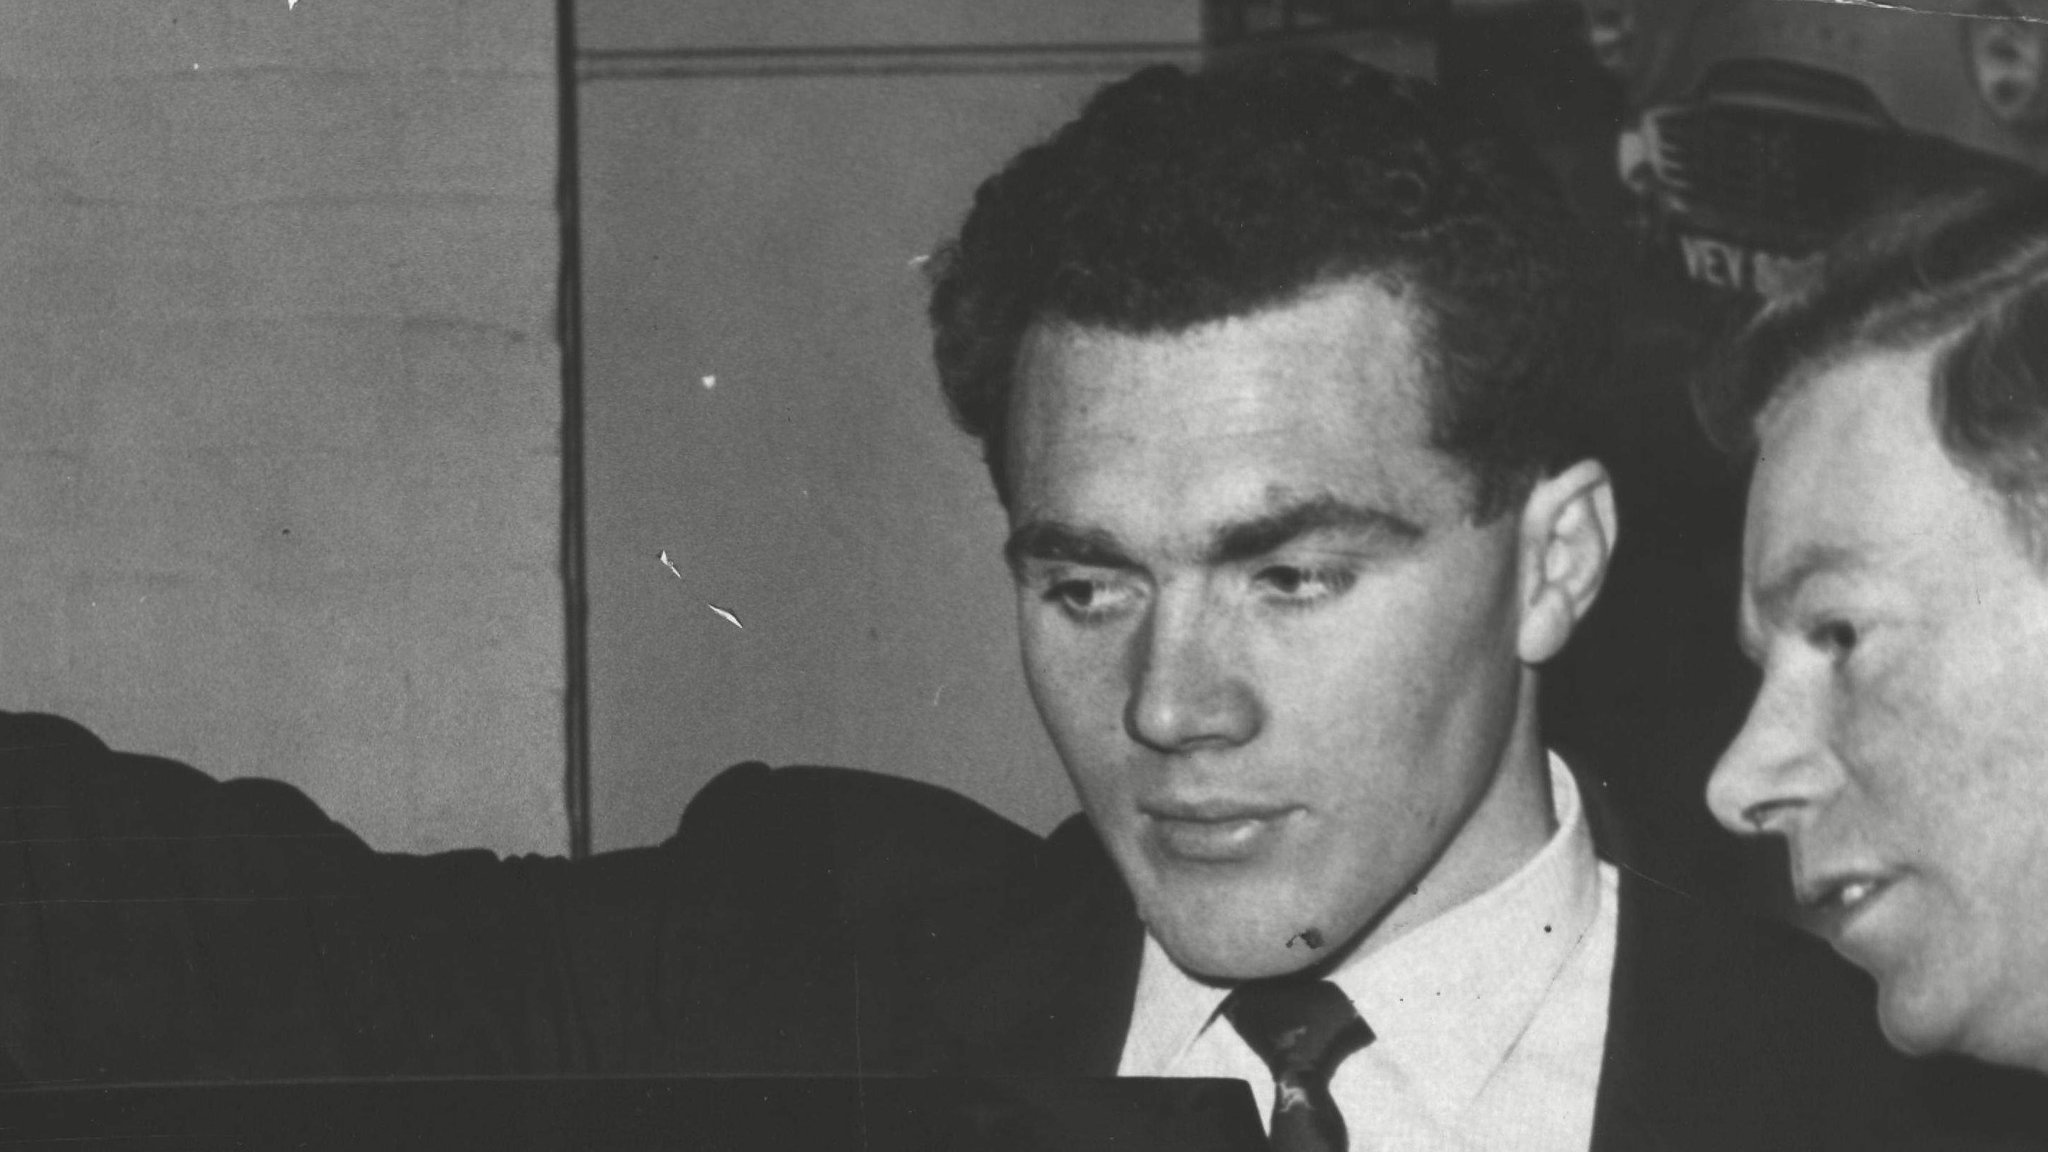 Former Wales flanker Haydn Morgan dies aged 81